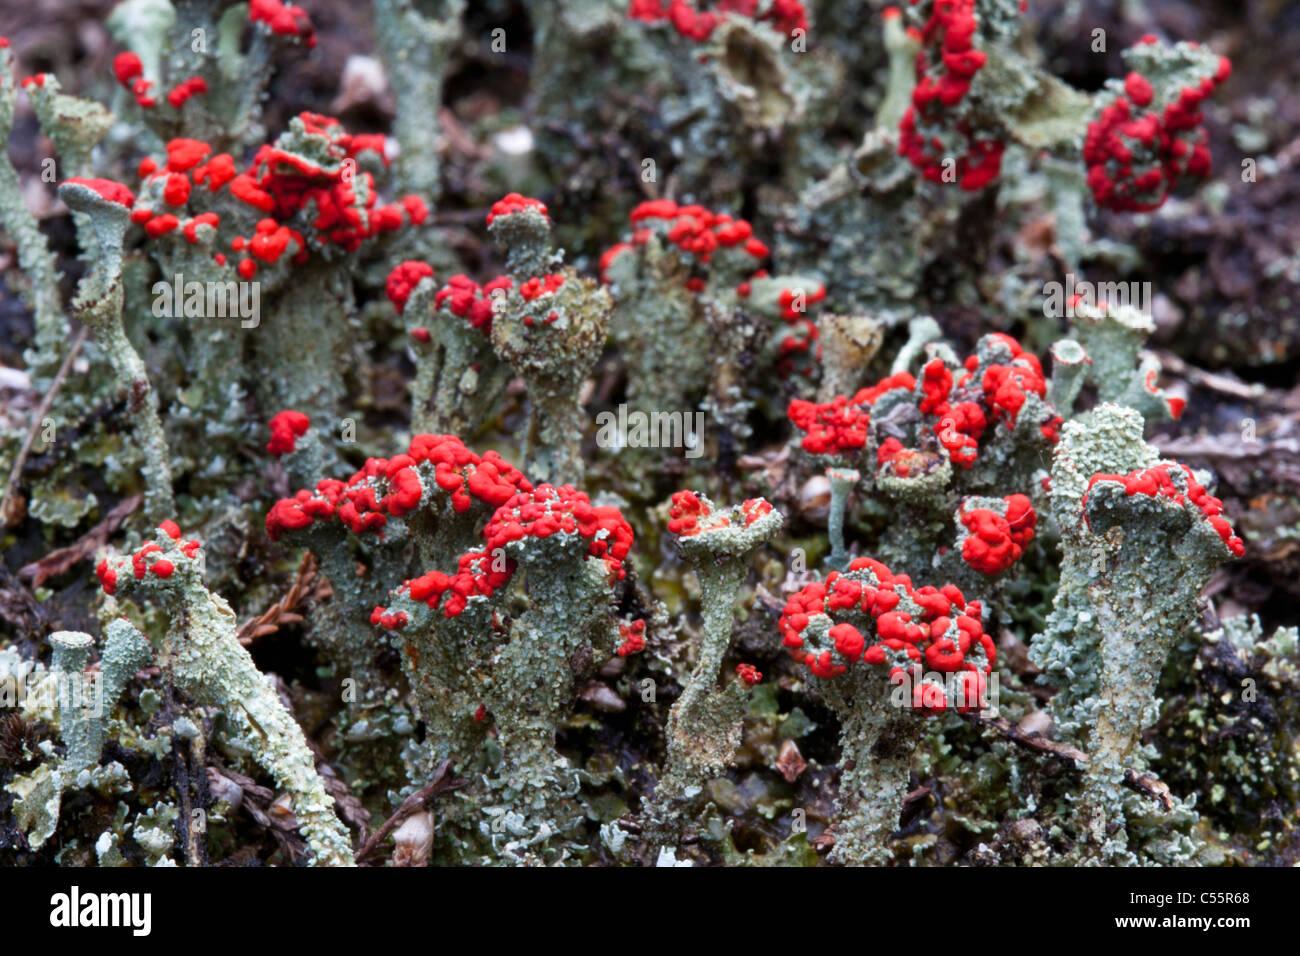 The Netherlands, Loon op Zand, National Park De Loonse en Drunense Duinen. Typical plants. - Stock Image